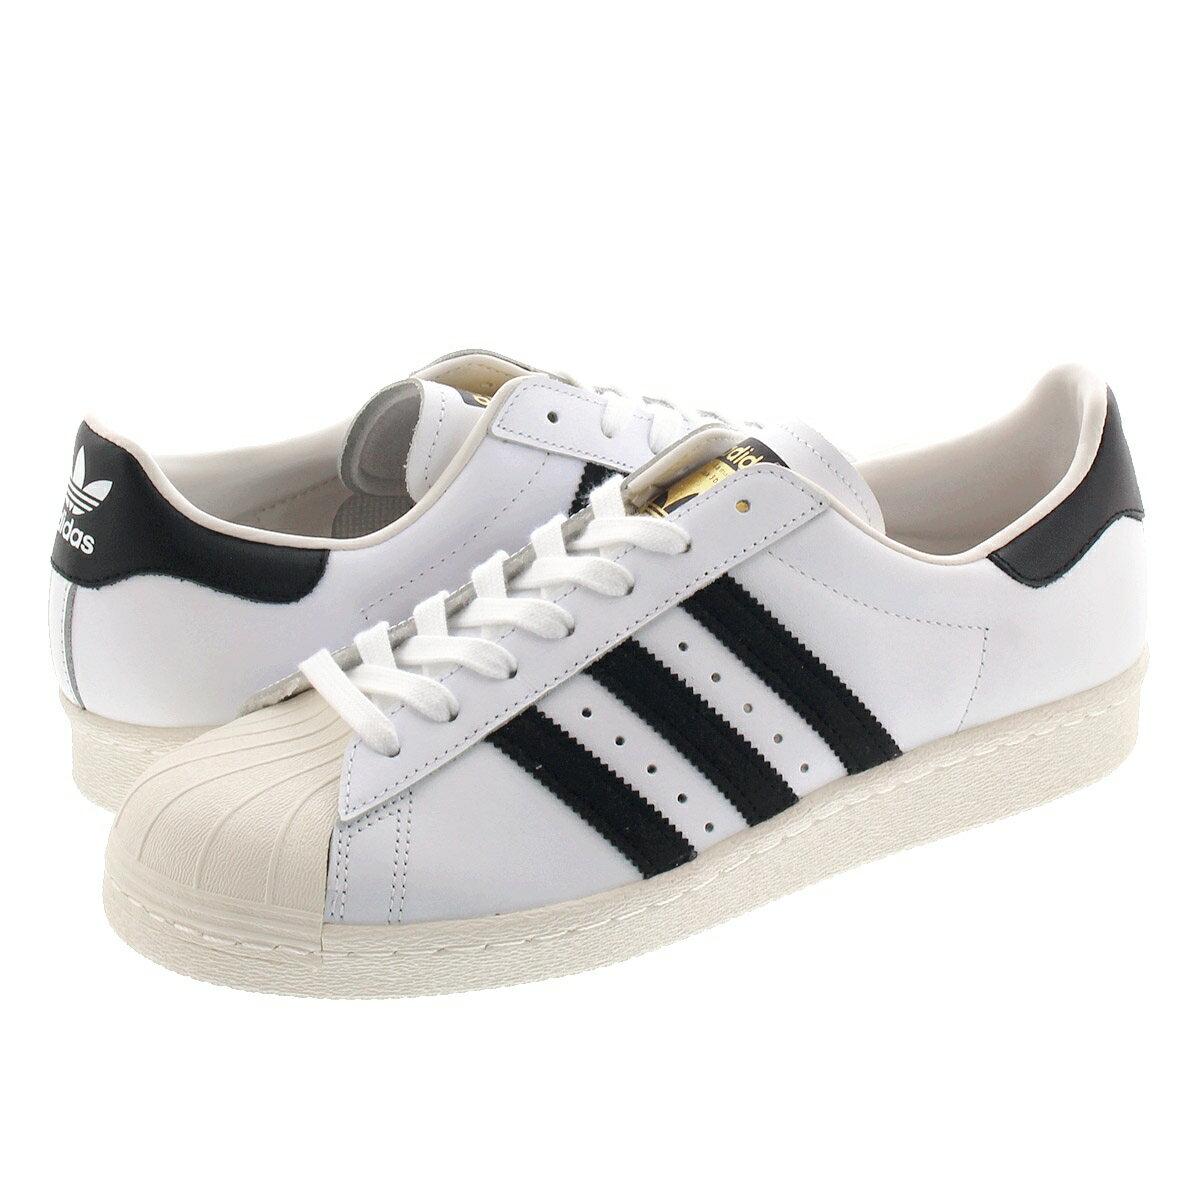 adidas originals SUPER STAR 80s 【メンズ】【レディース】アディダス オリジナルス スーパースター 80s WHITE/BLACK